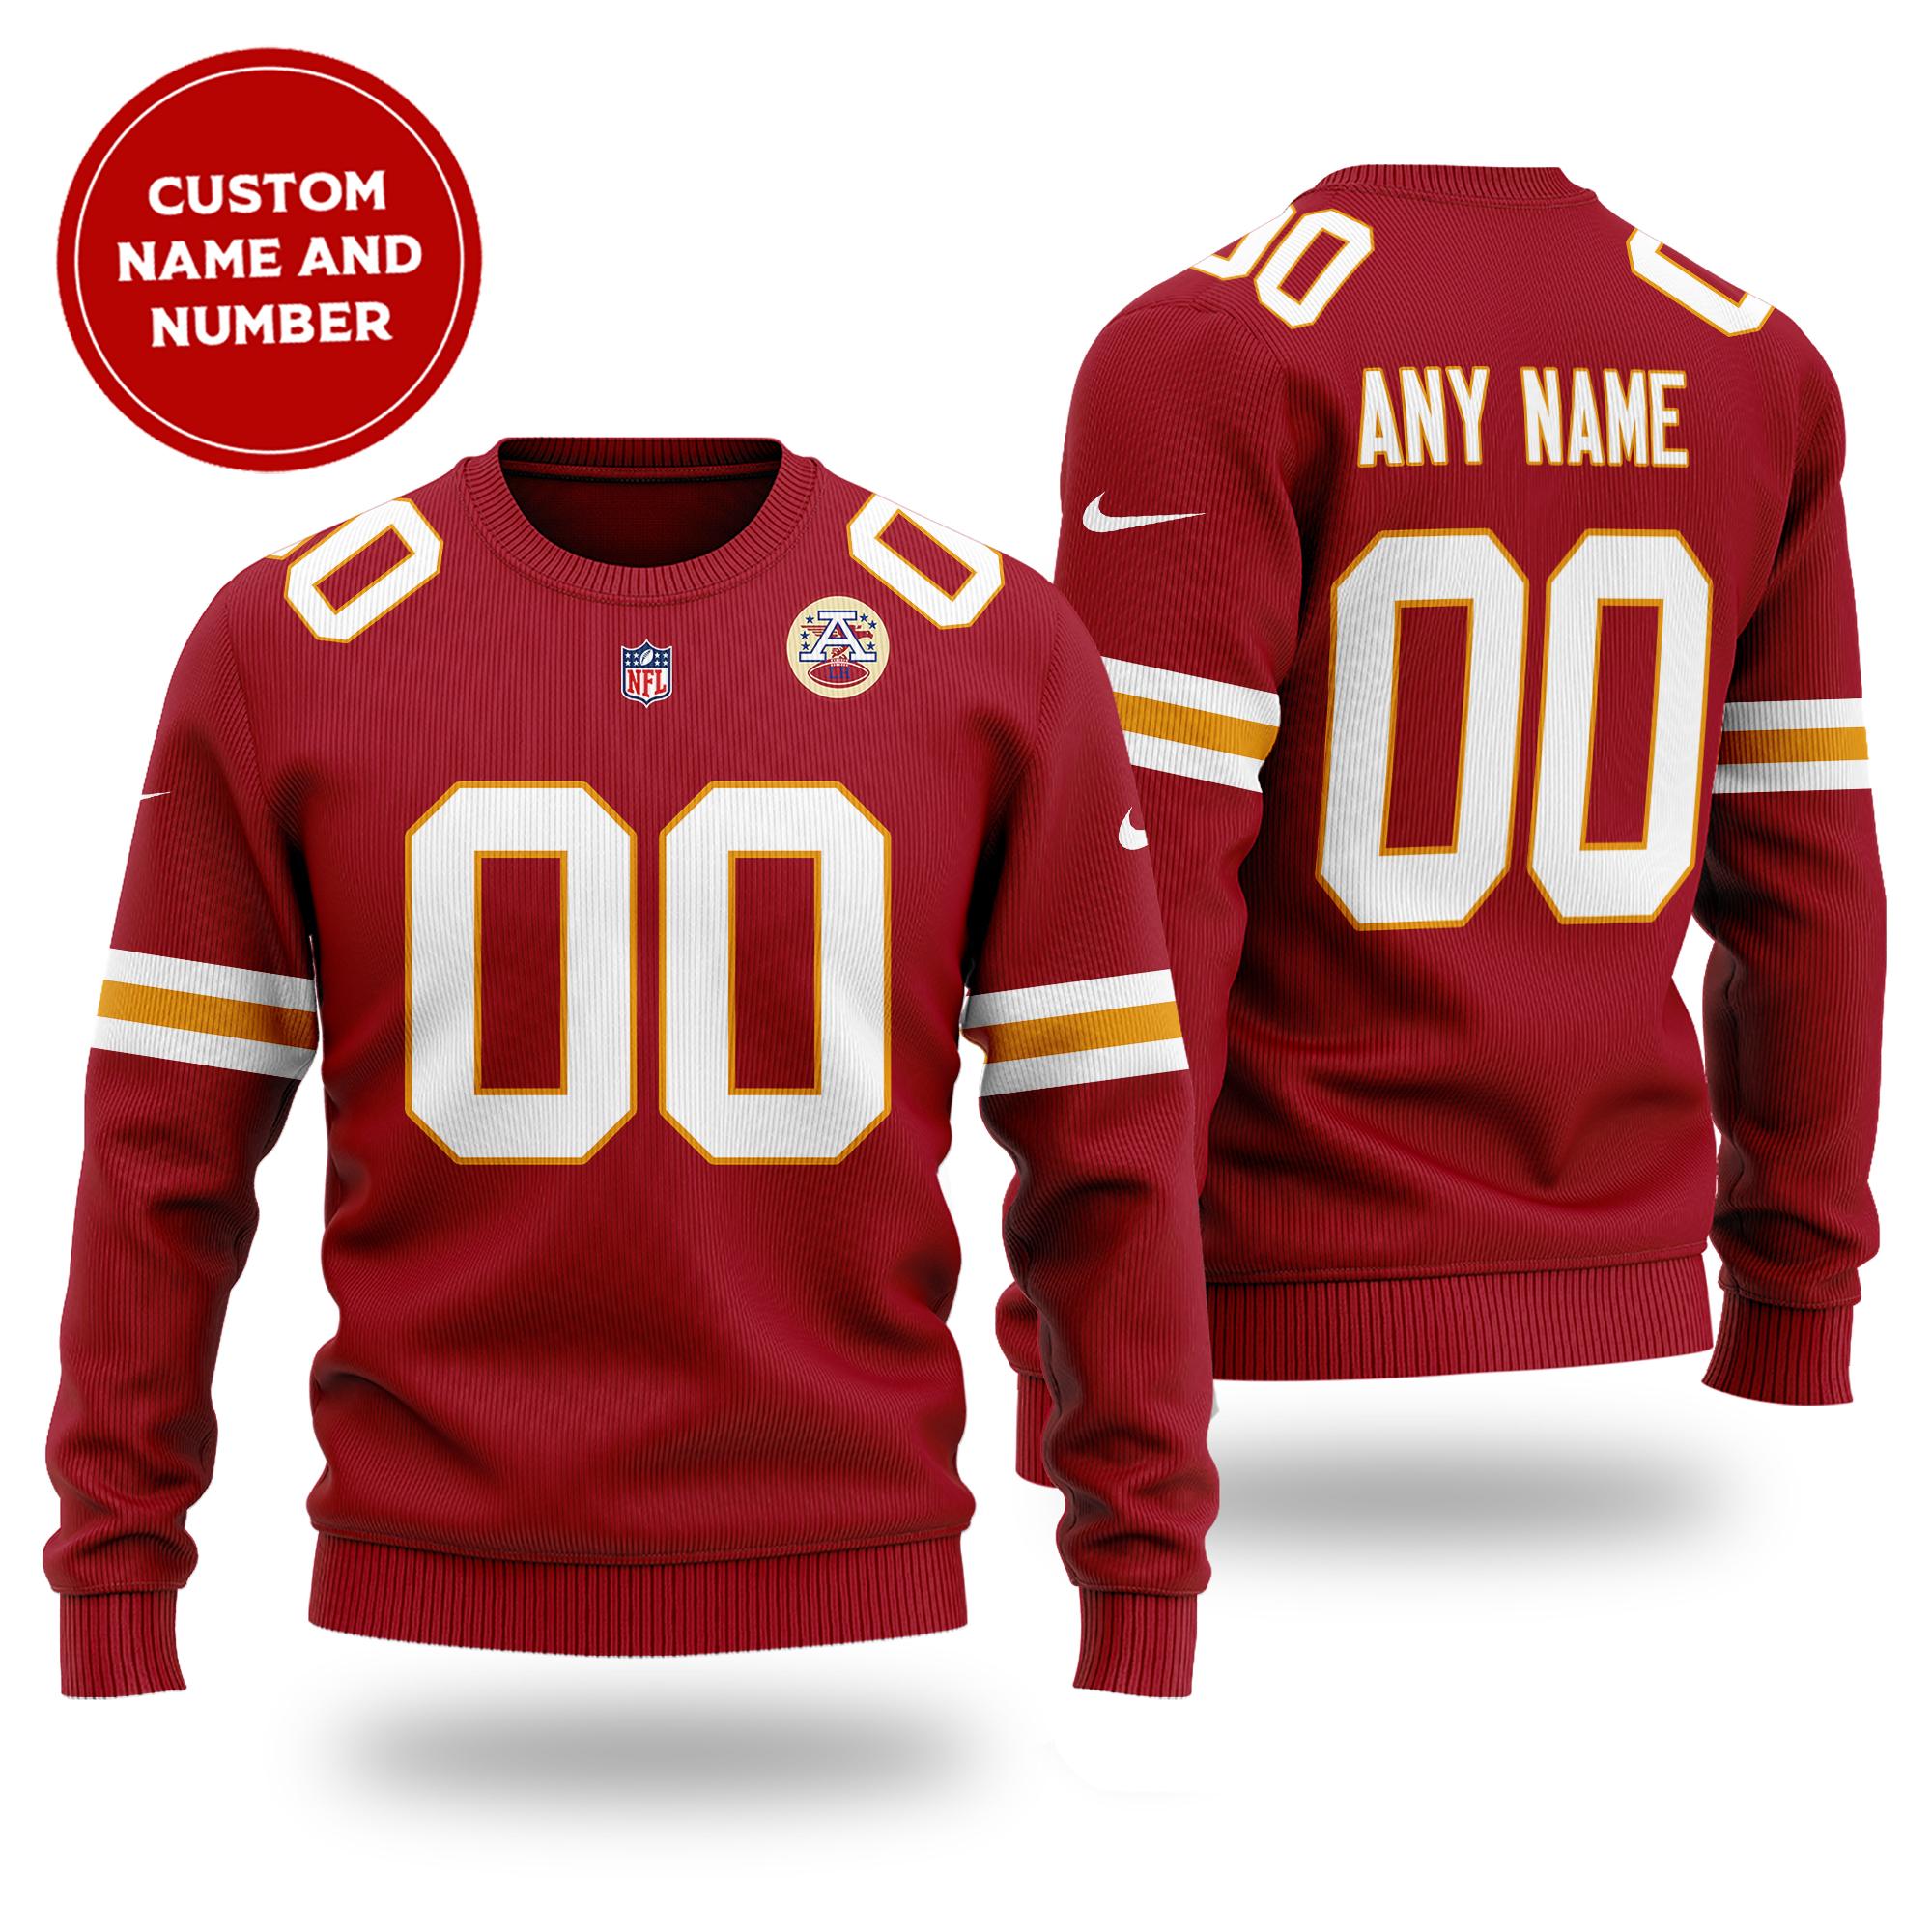 Customized NFL KANSAS CITY CHIEFS red wool Sweater